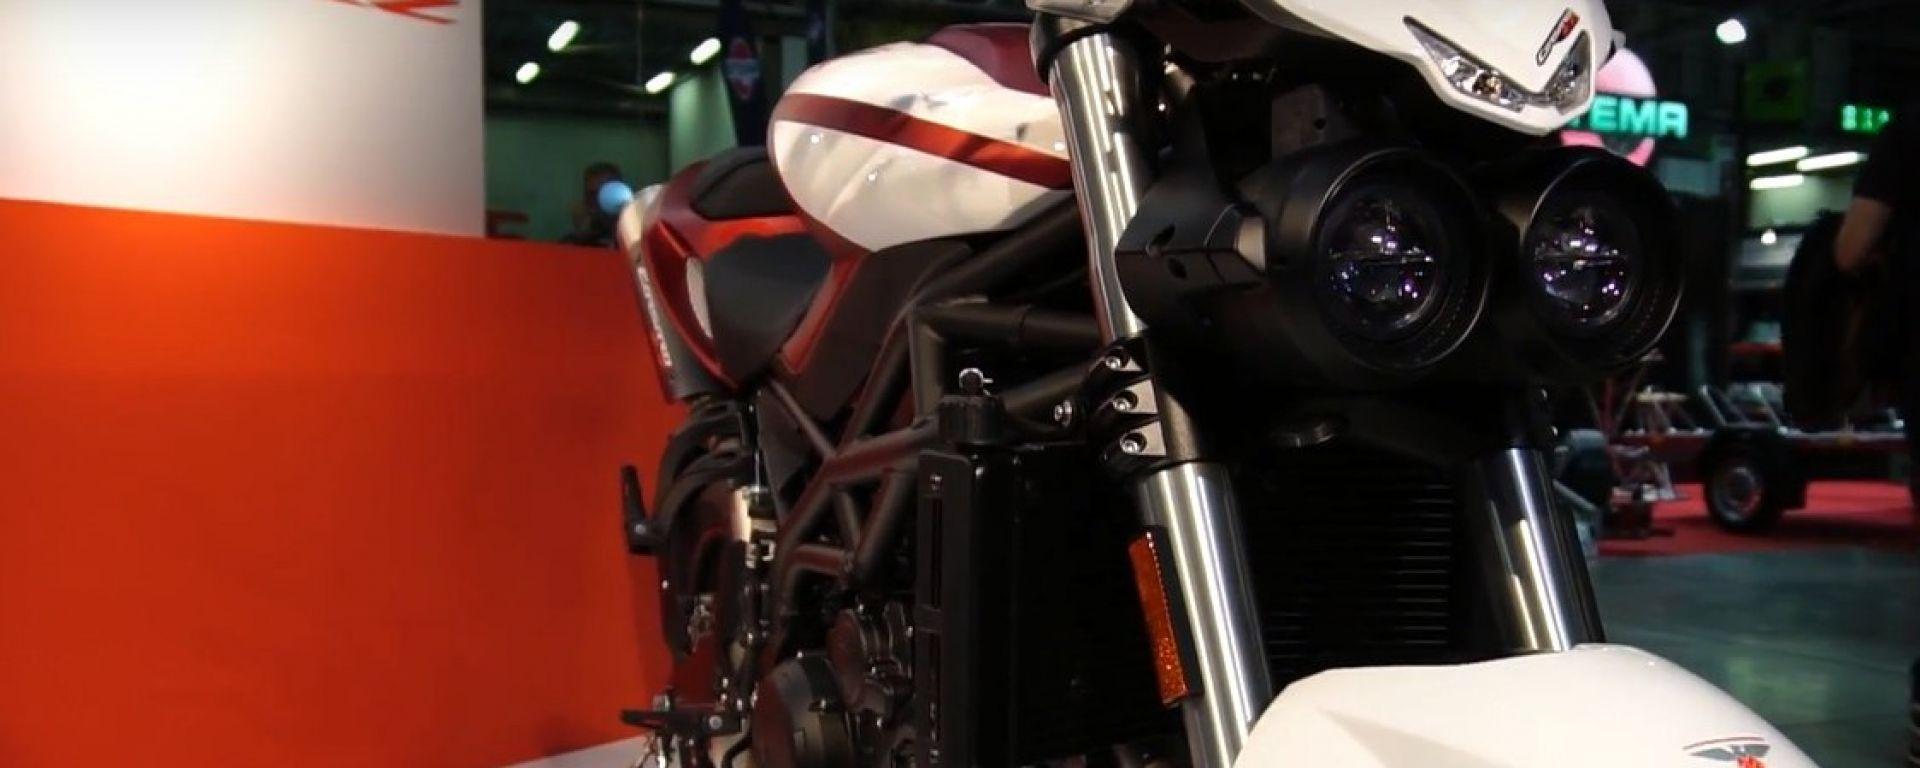 Eicma 2016: Moto Morini Corsaro 1200 ZZ